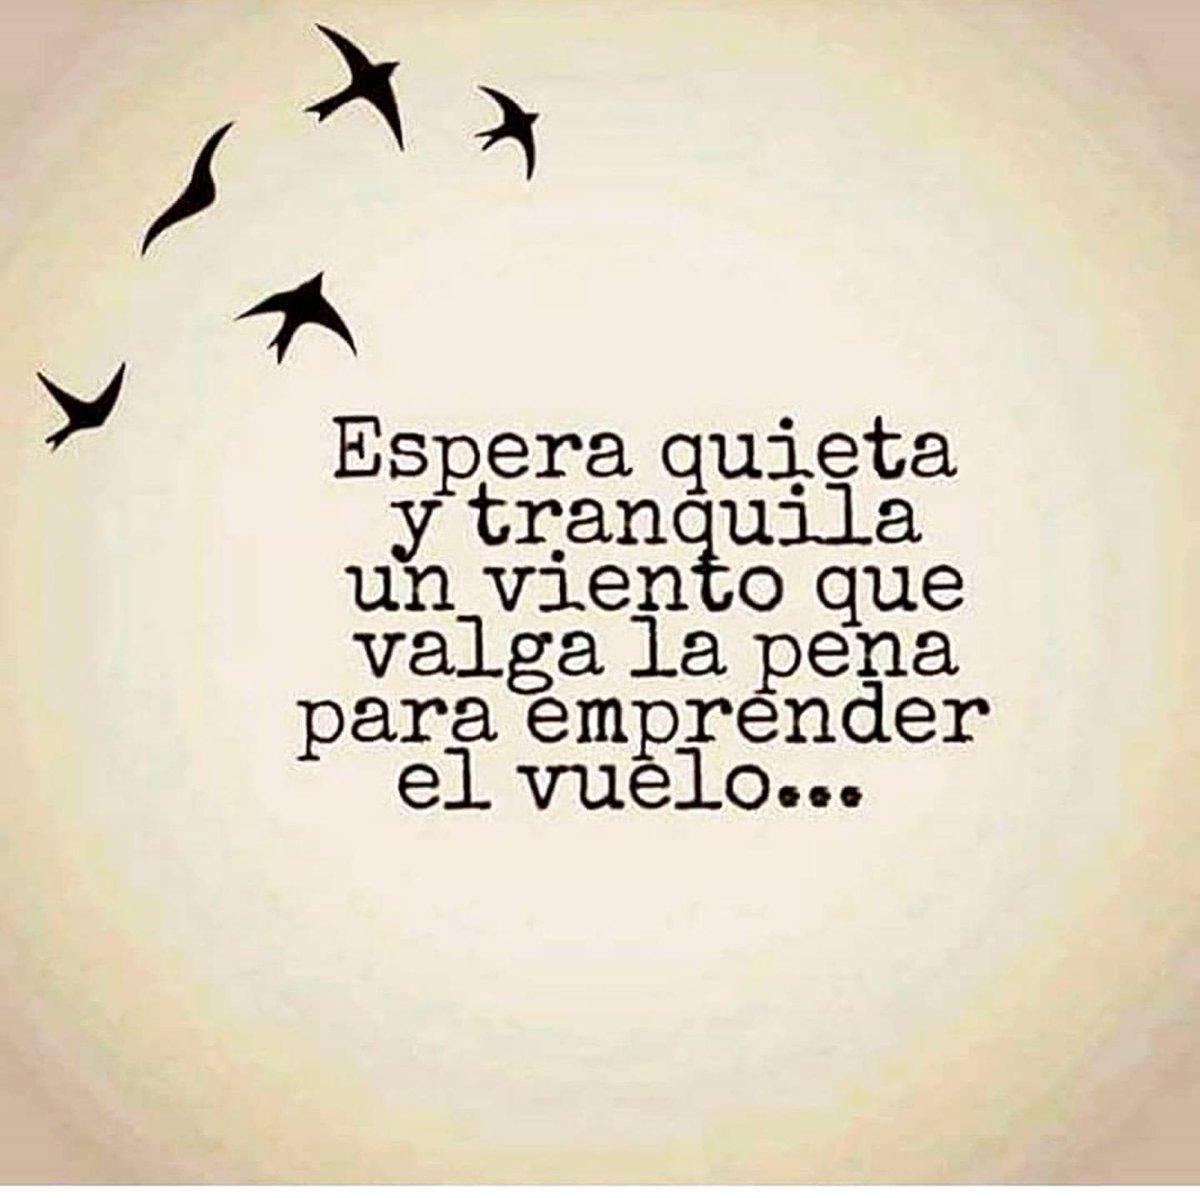 Quijotadas De Amor On Twitter Quijotadasdeamor Espera